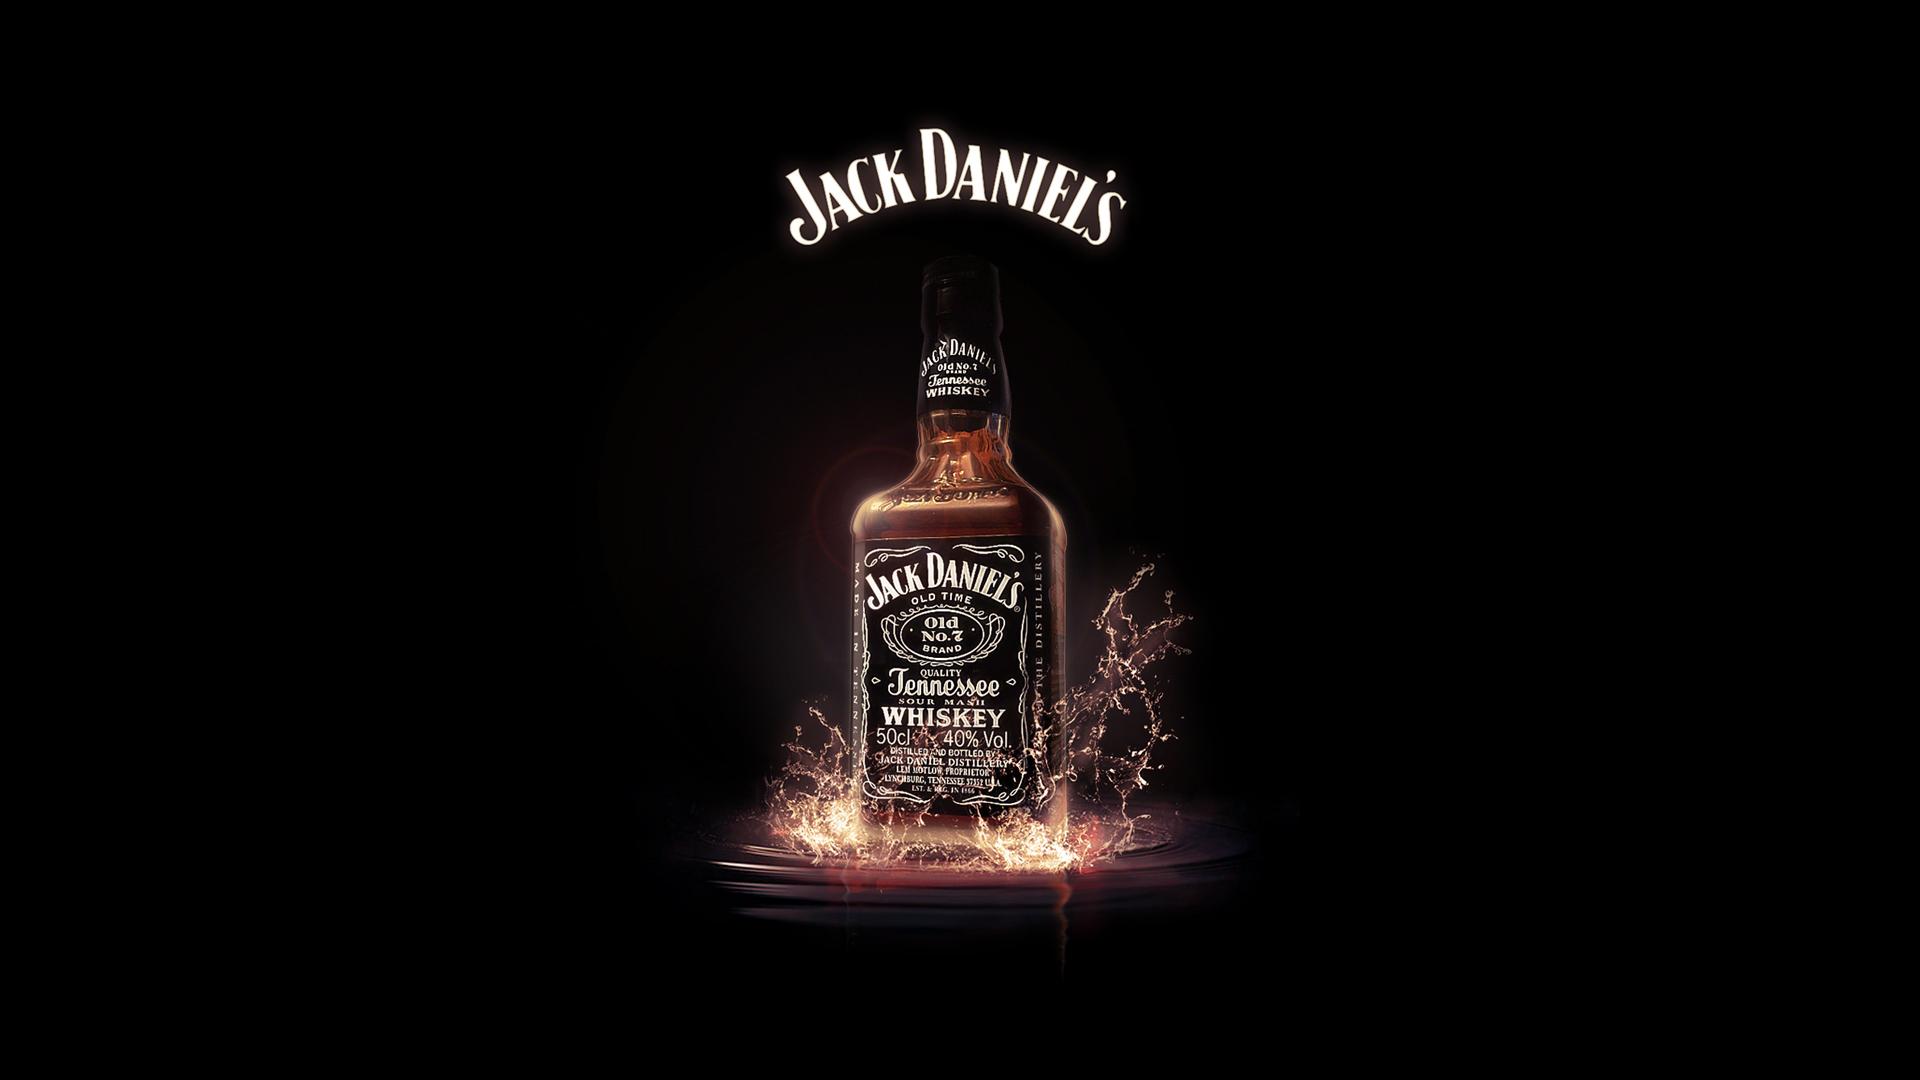 Jack Daniels Alcohol Drinks HD Wallpaper Background 1920x1080